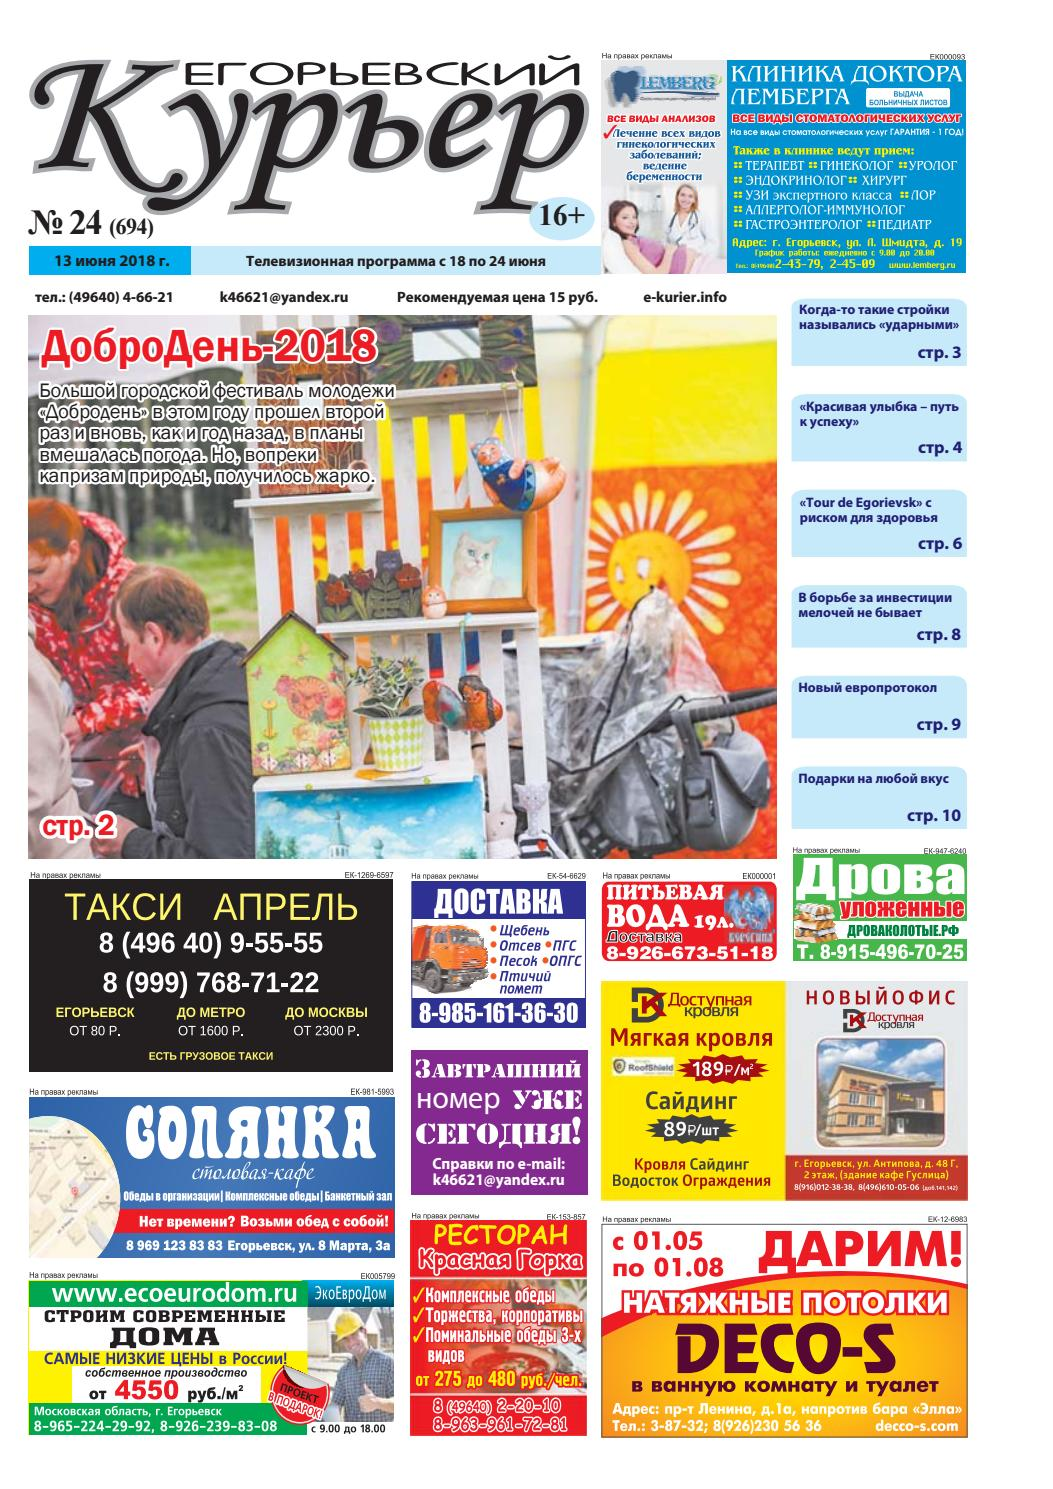 faf9ff566bd6 Курьер 24 от 13.06.2018г by Егорьевский КУРЬЕР - issuu